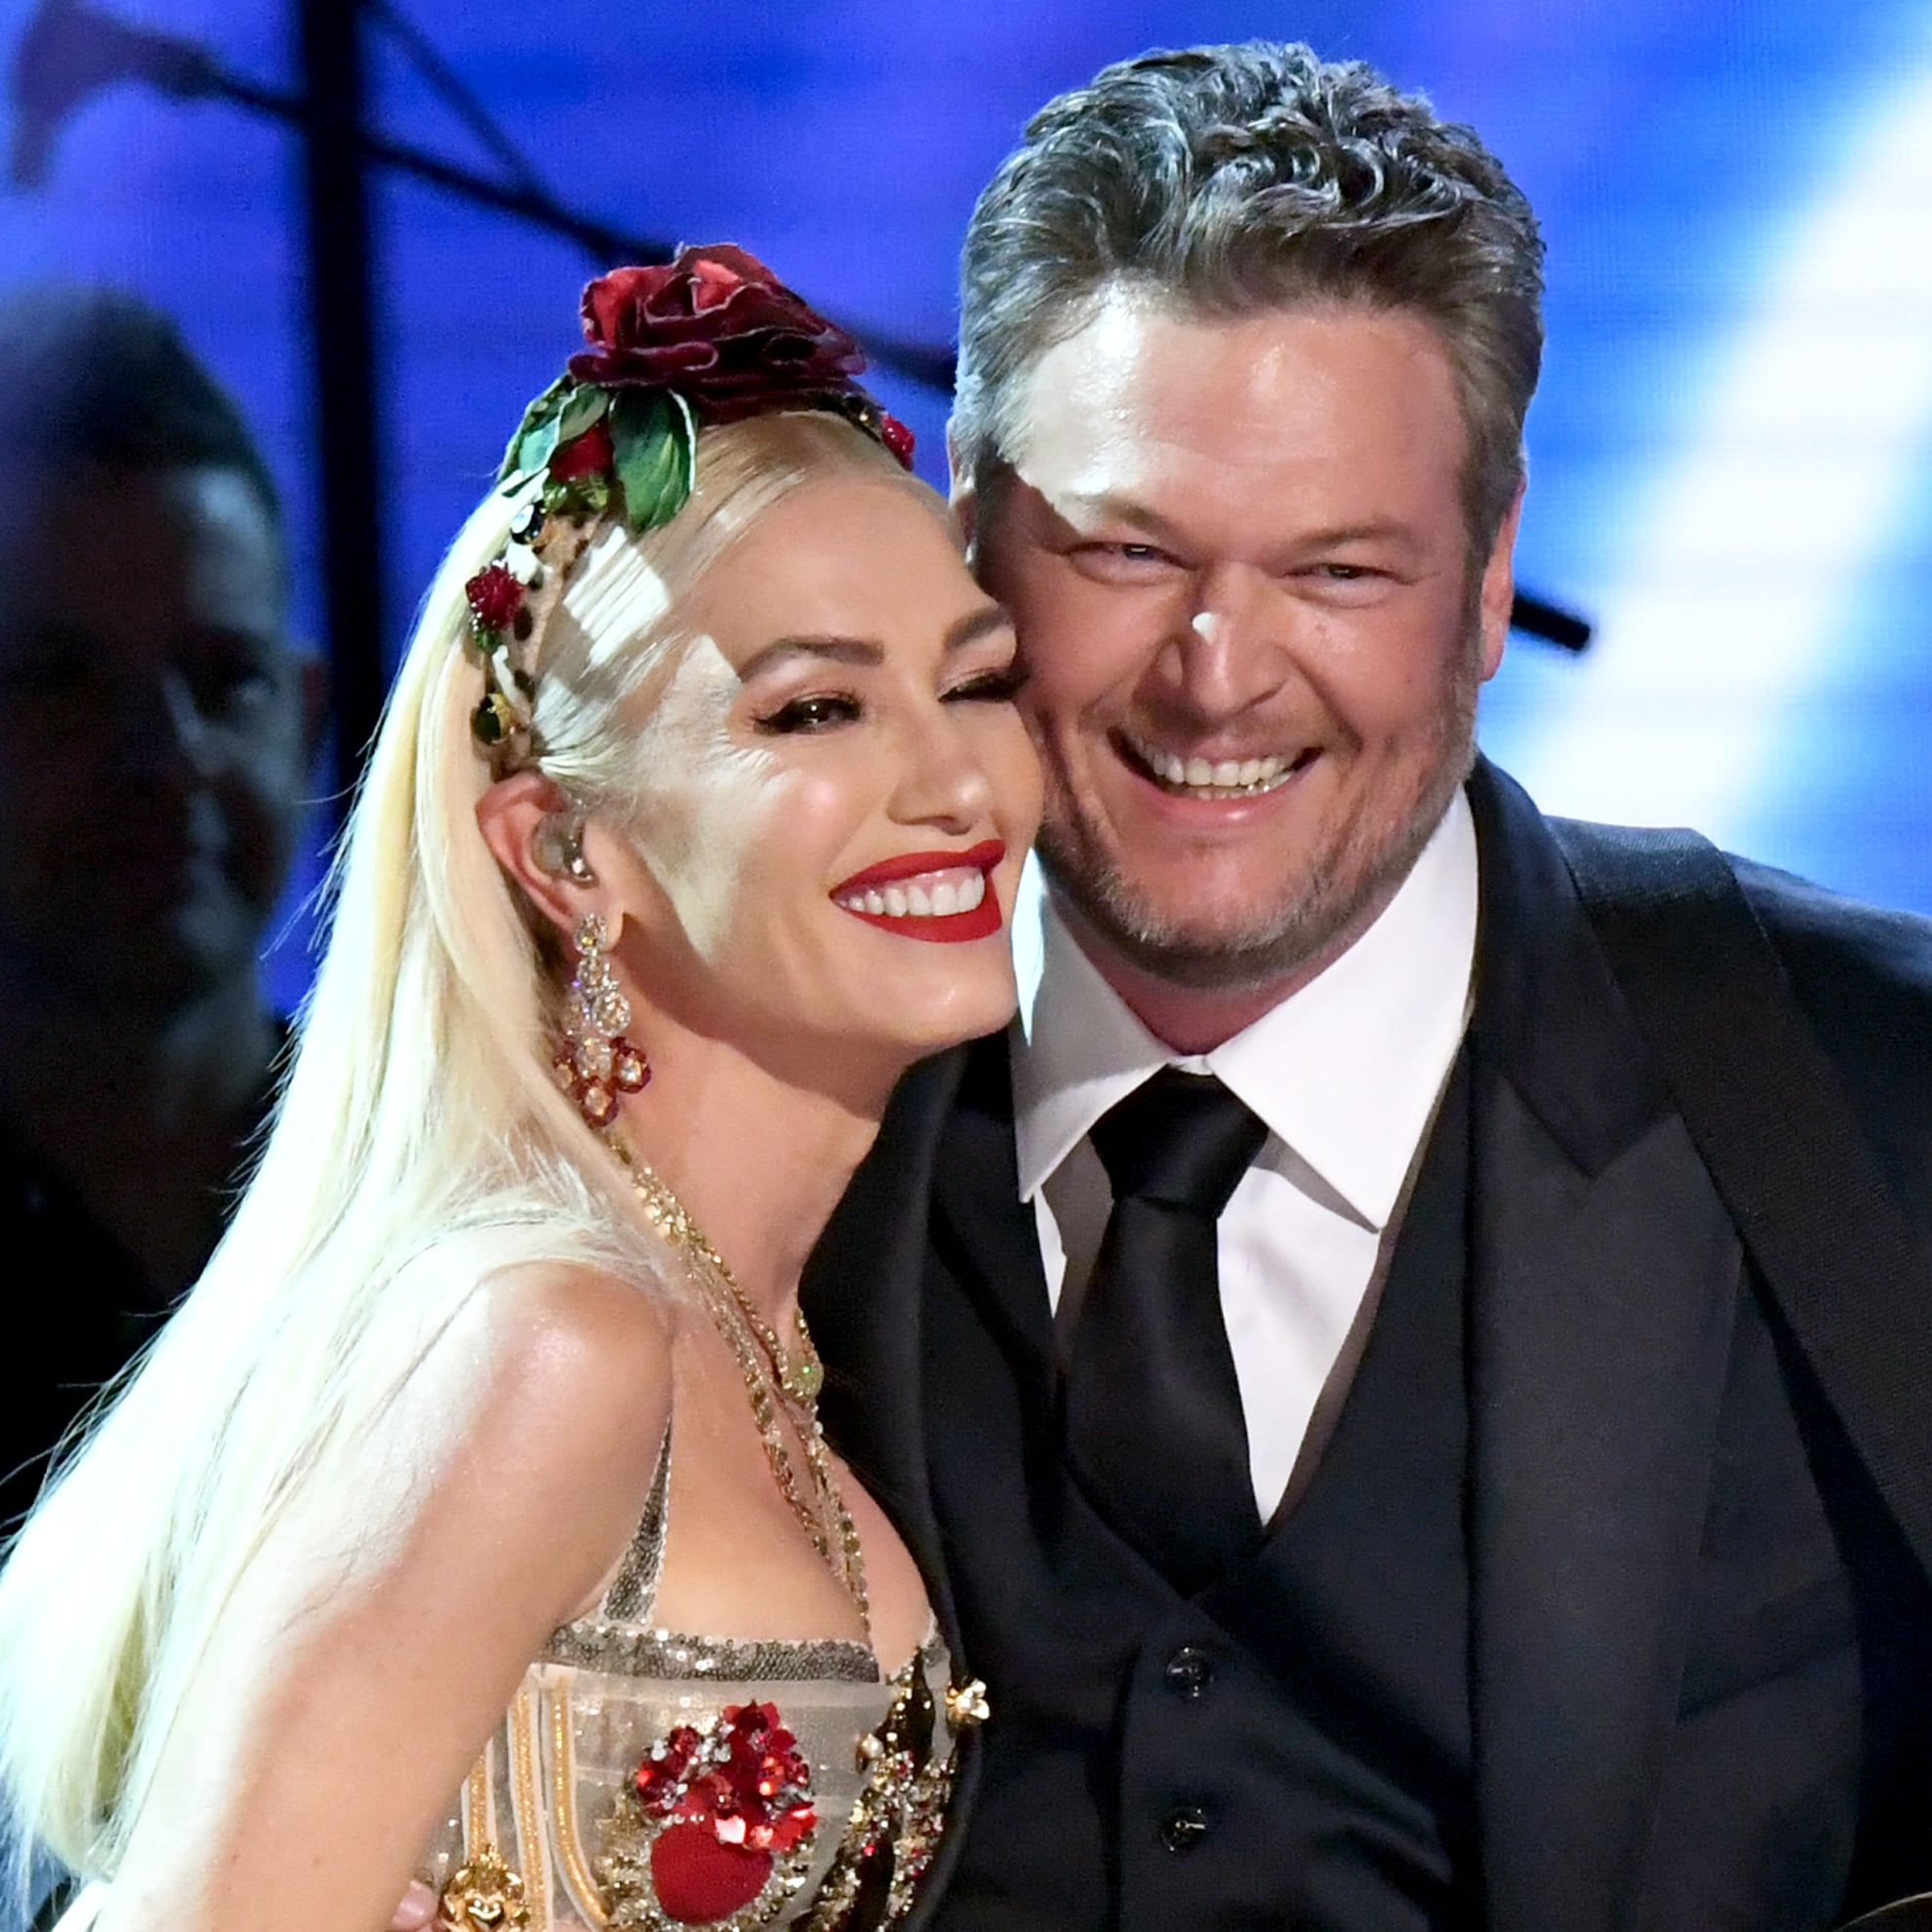 Blake Shelton-Gwen Stefani Finally Married, Exchange Wedding Vows in Intimate Ceremony